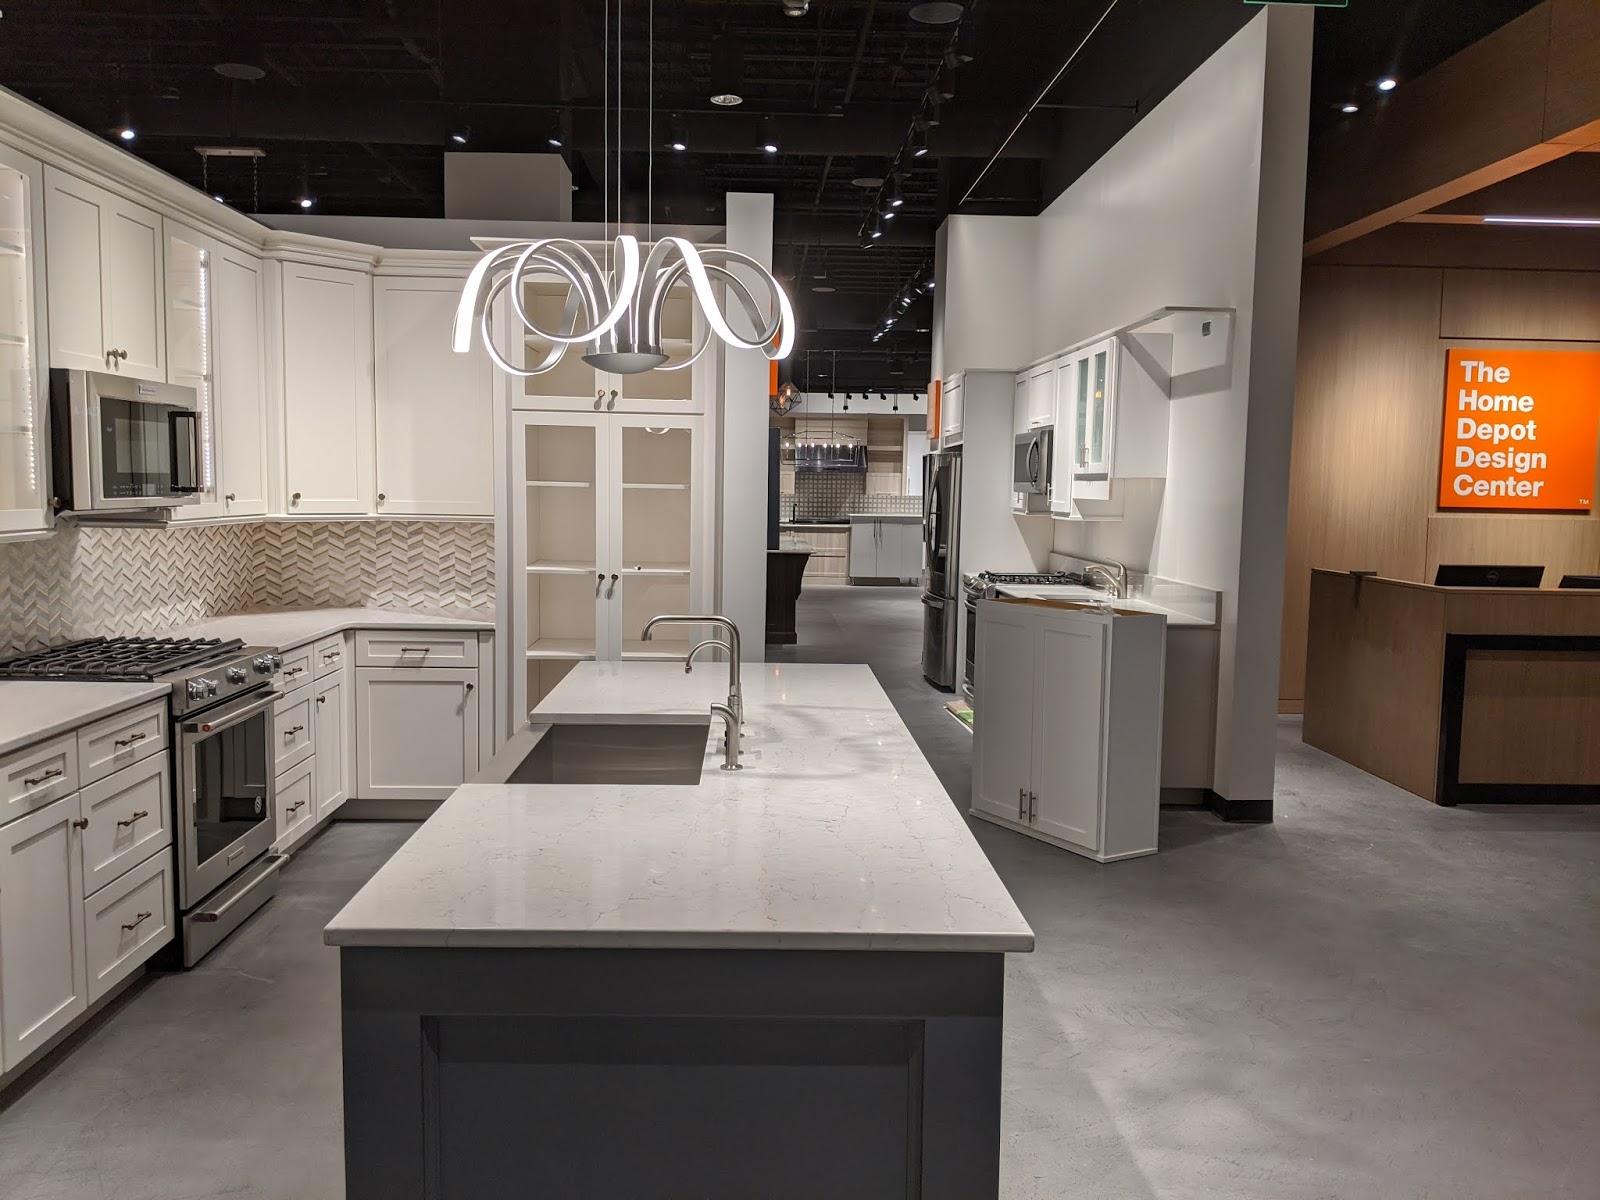 Rockville Nights Home Depot Design Center Sets Opening Date At Montrose Crossing In Rockville